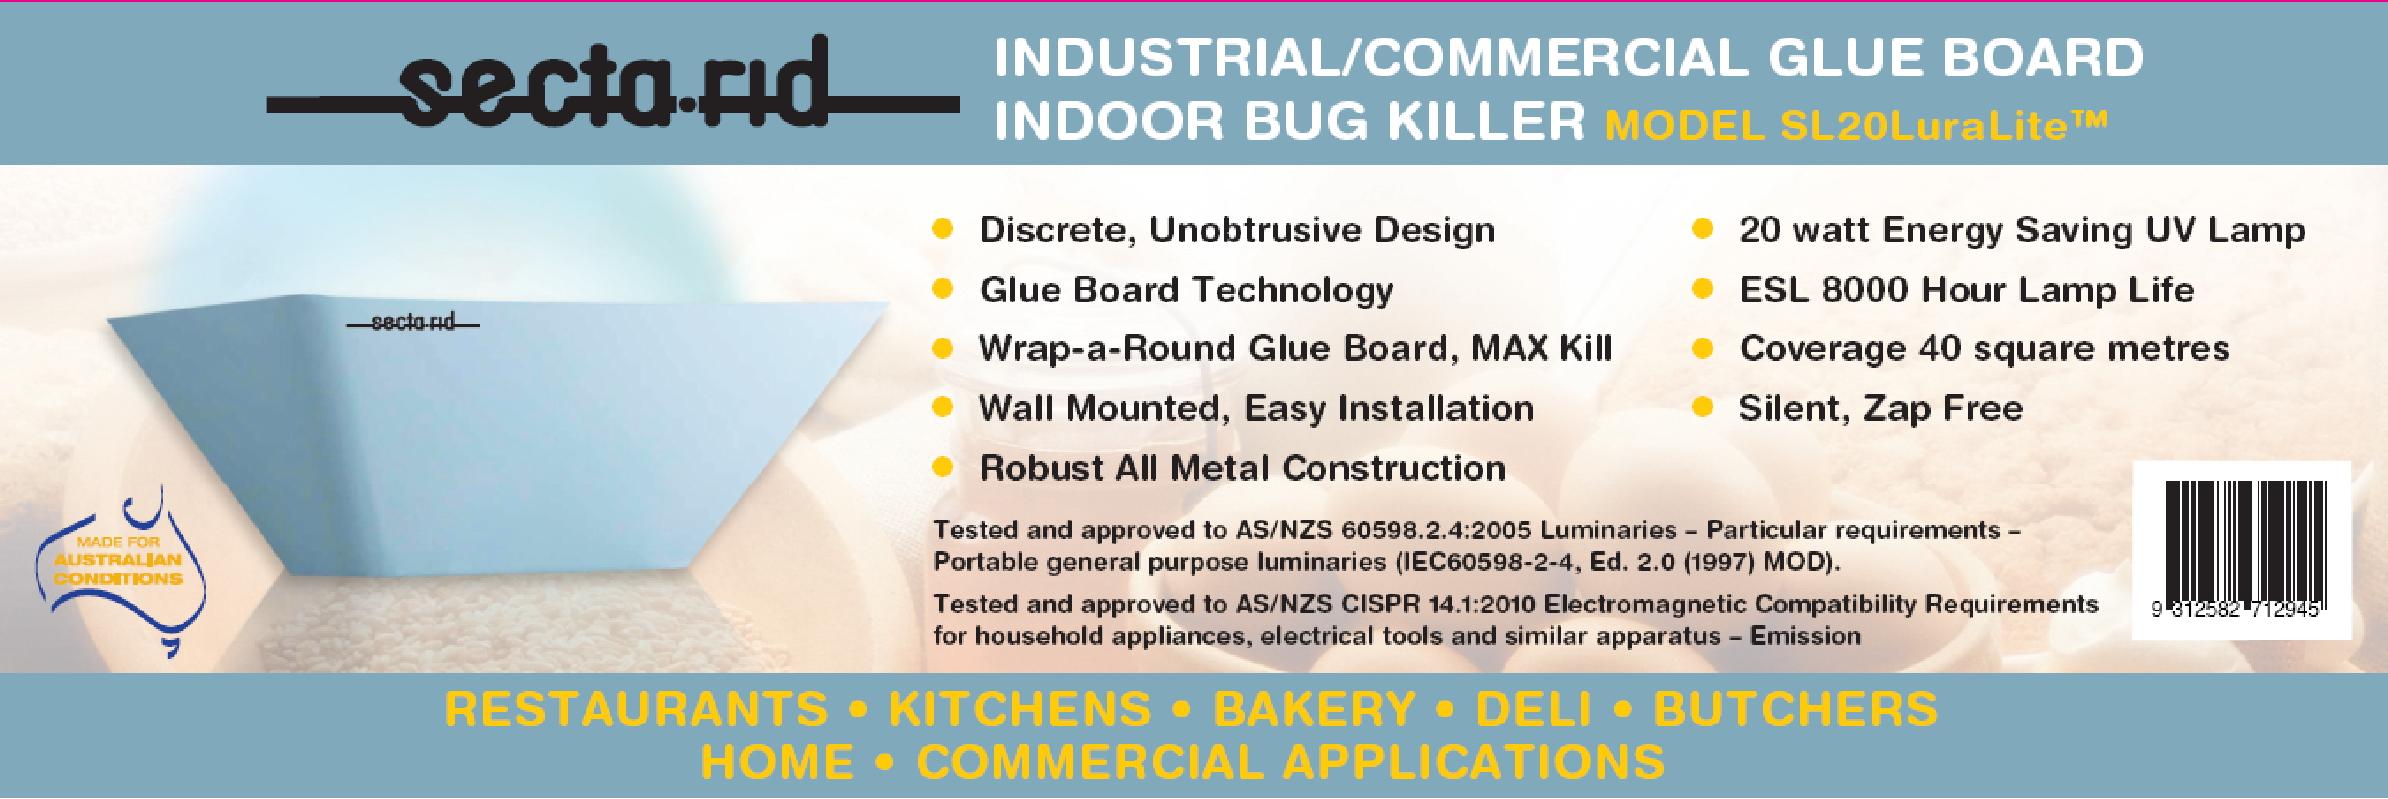 SR20 Luralite Commercial Glue Board Fly Trap